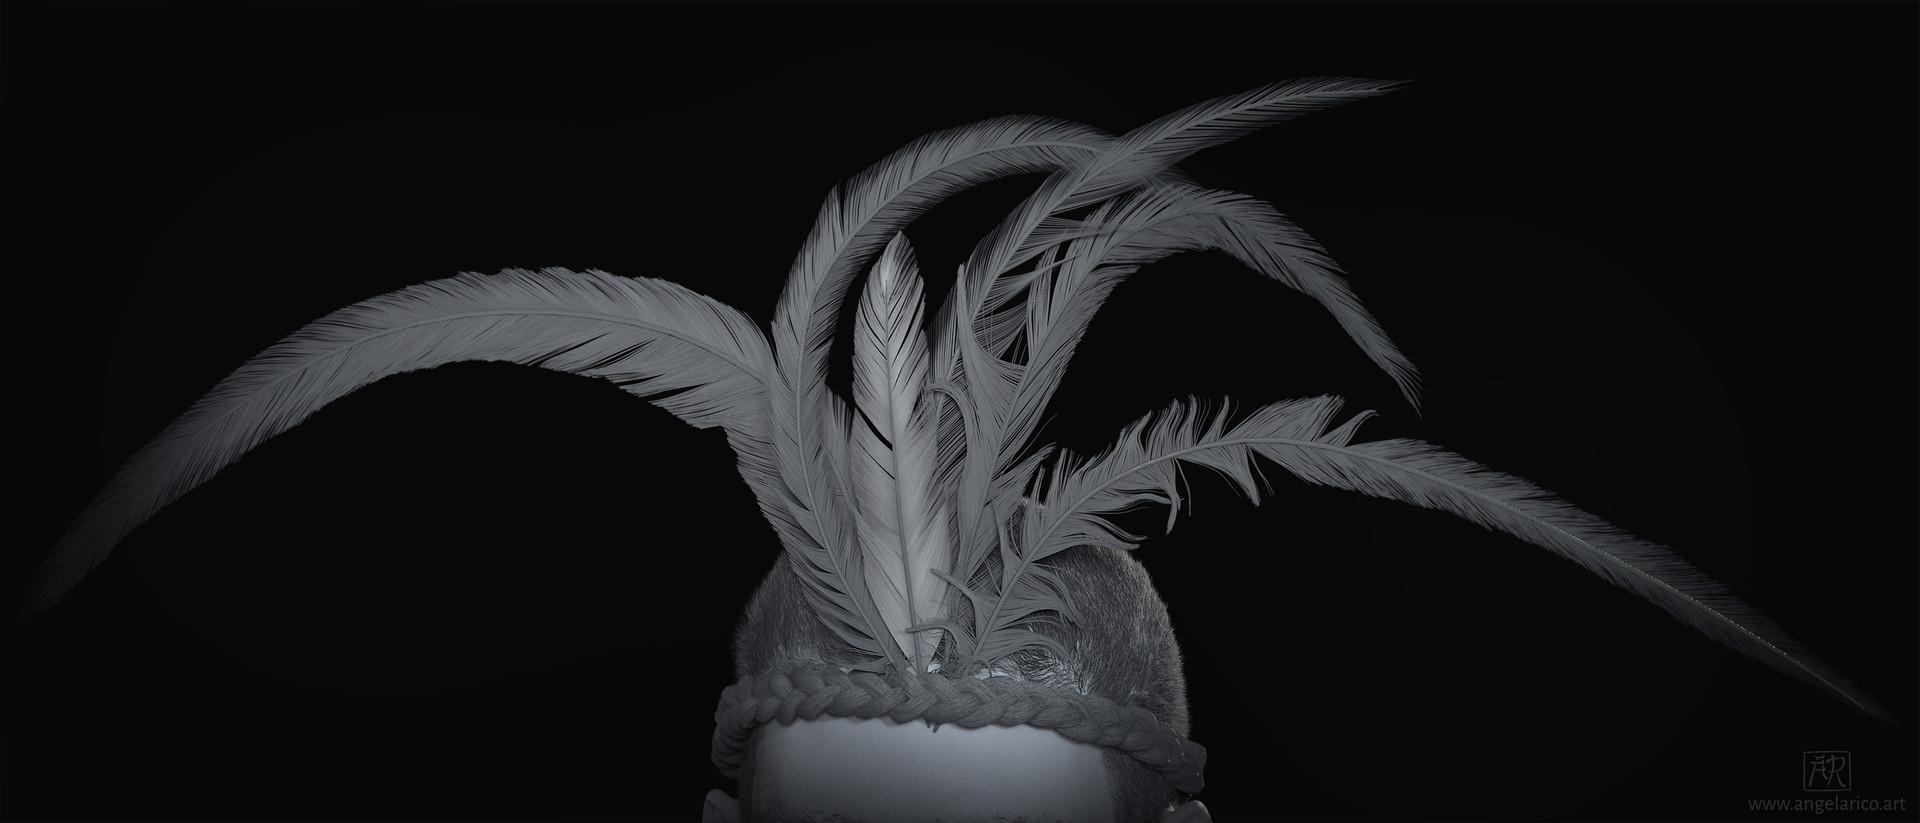 [Image: angela-rico-feathersgray-s.jpg?1541928809]